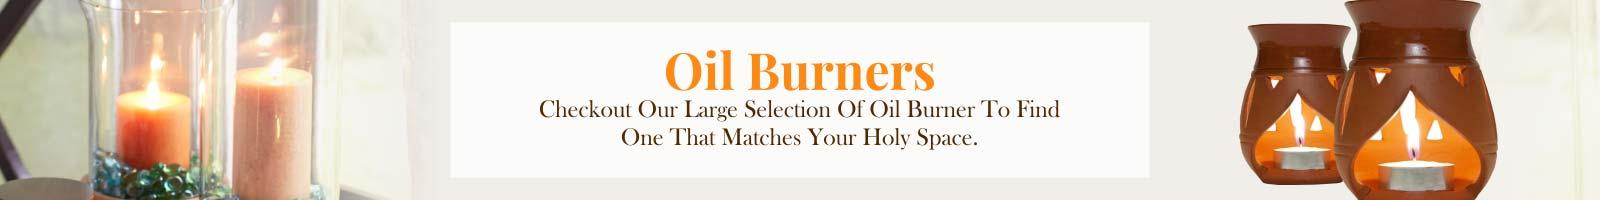 Oil Burners